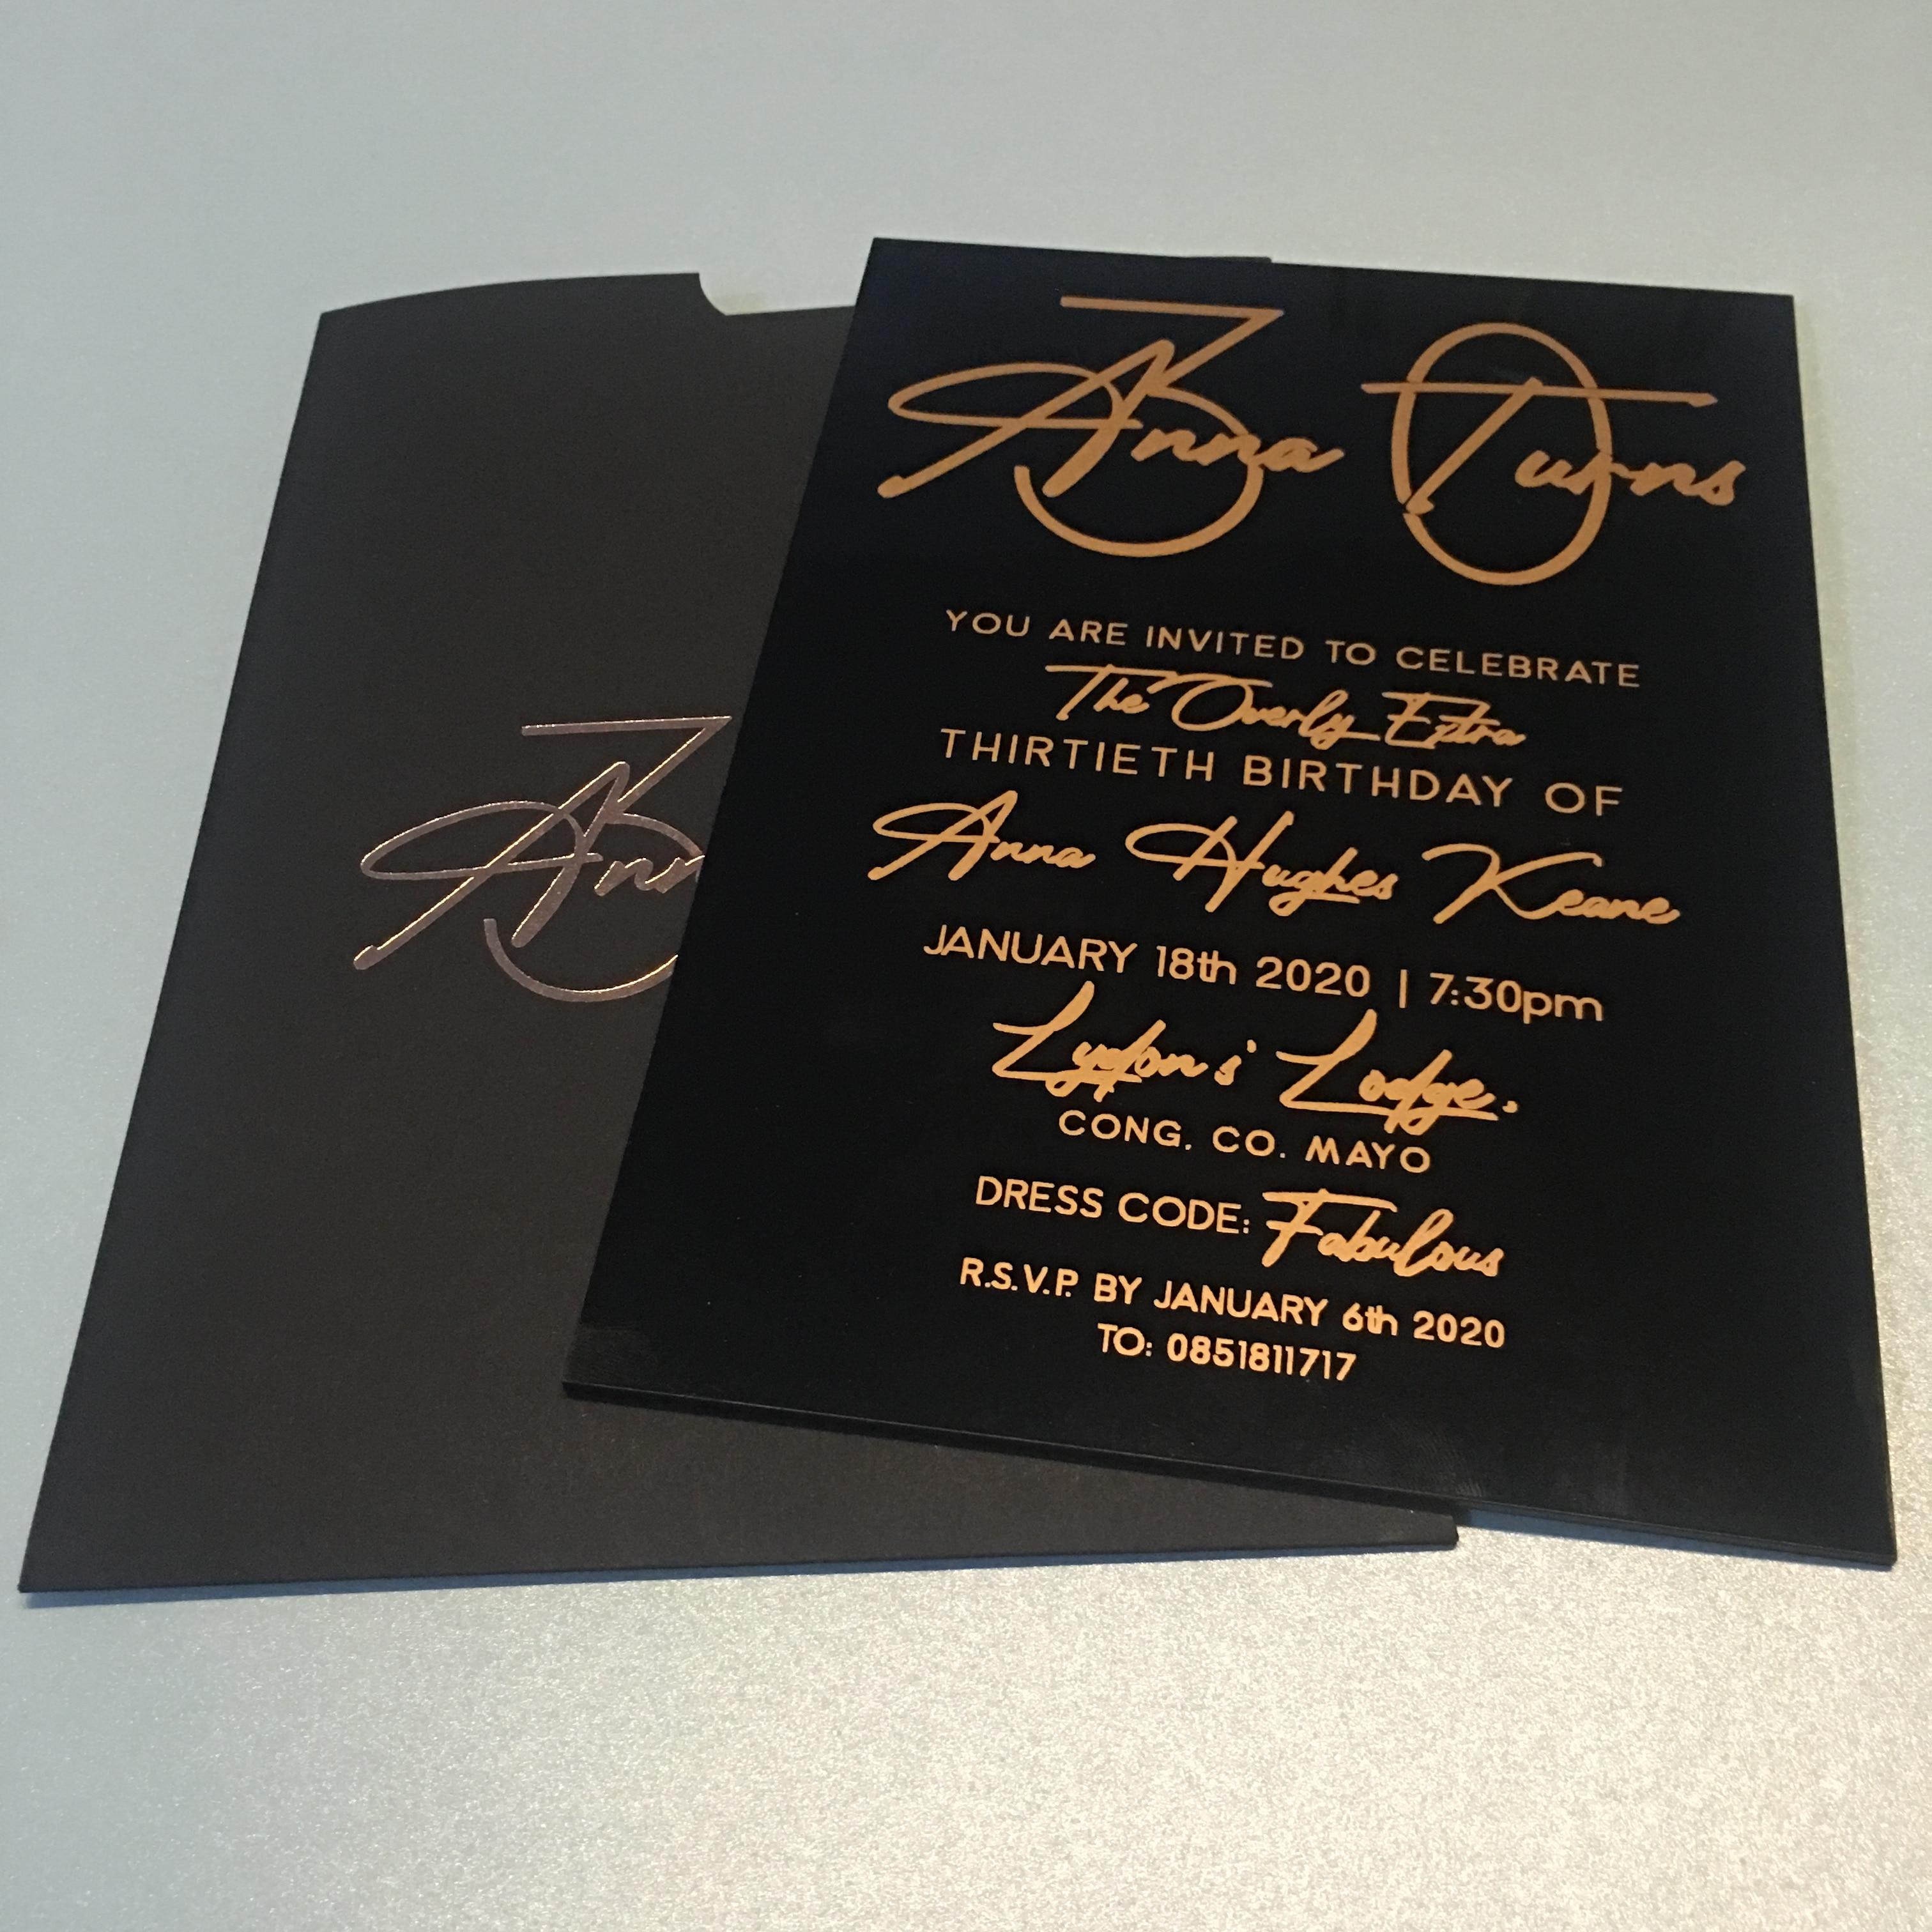 High Class Elegant Black Acrylic Wedding Invitation Card Rose Gold Printing With Matching Black Envelop